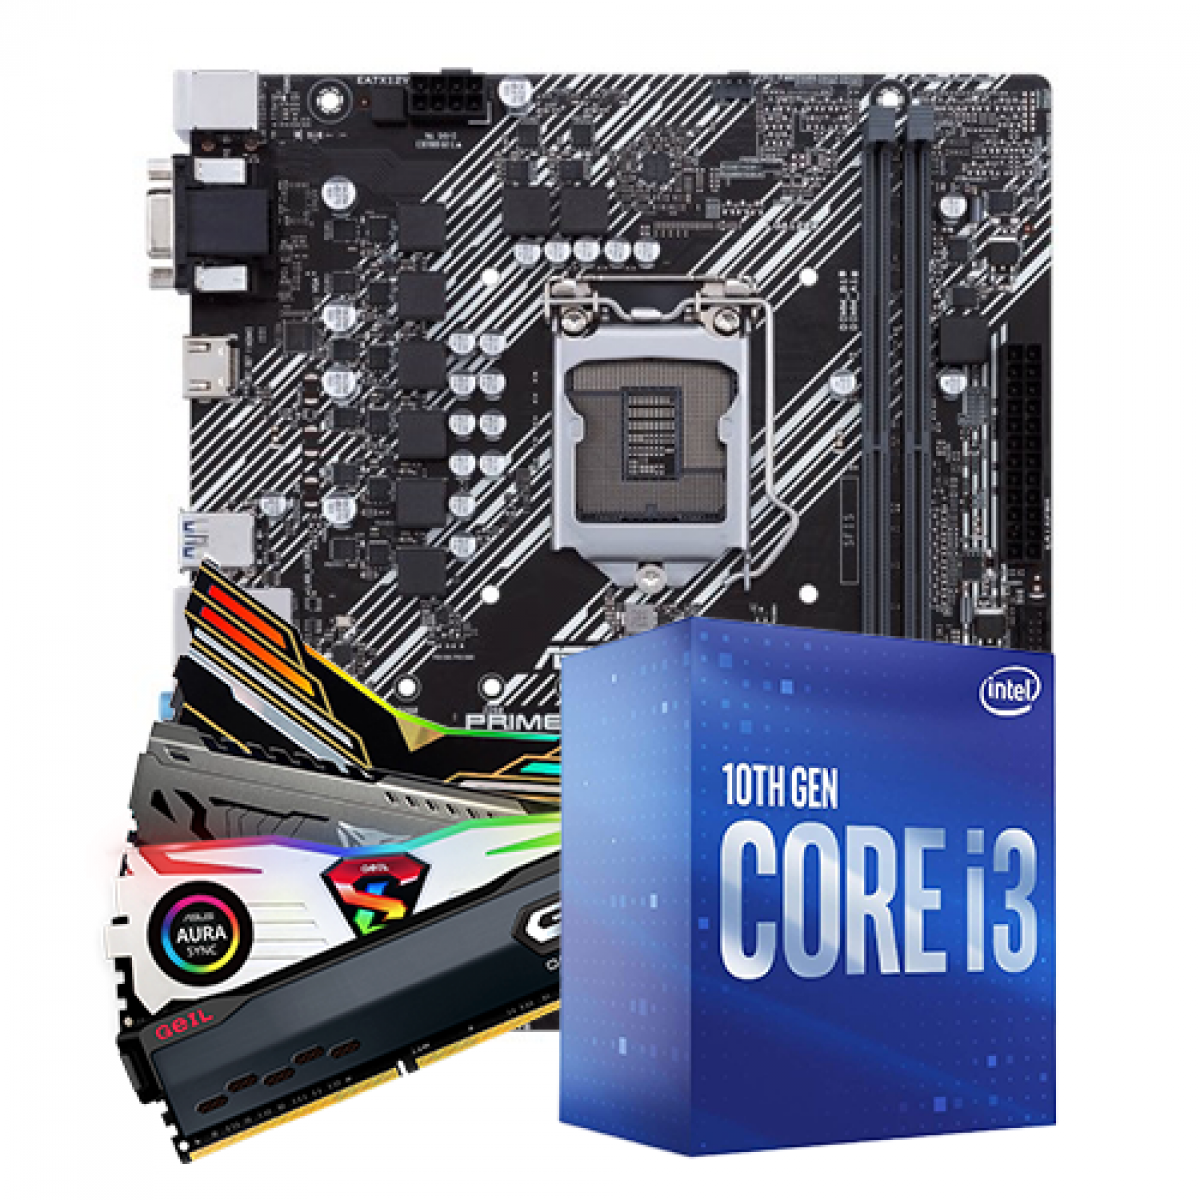 Kit Upgrade, Intel i3 10100F, ASUS Prime H410M-E, Memória DDR4 16GB (2x8GB) 3000MHz